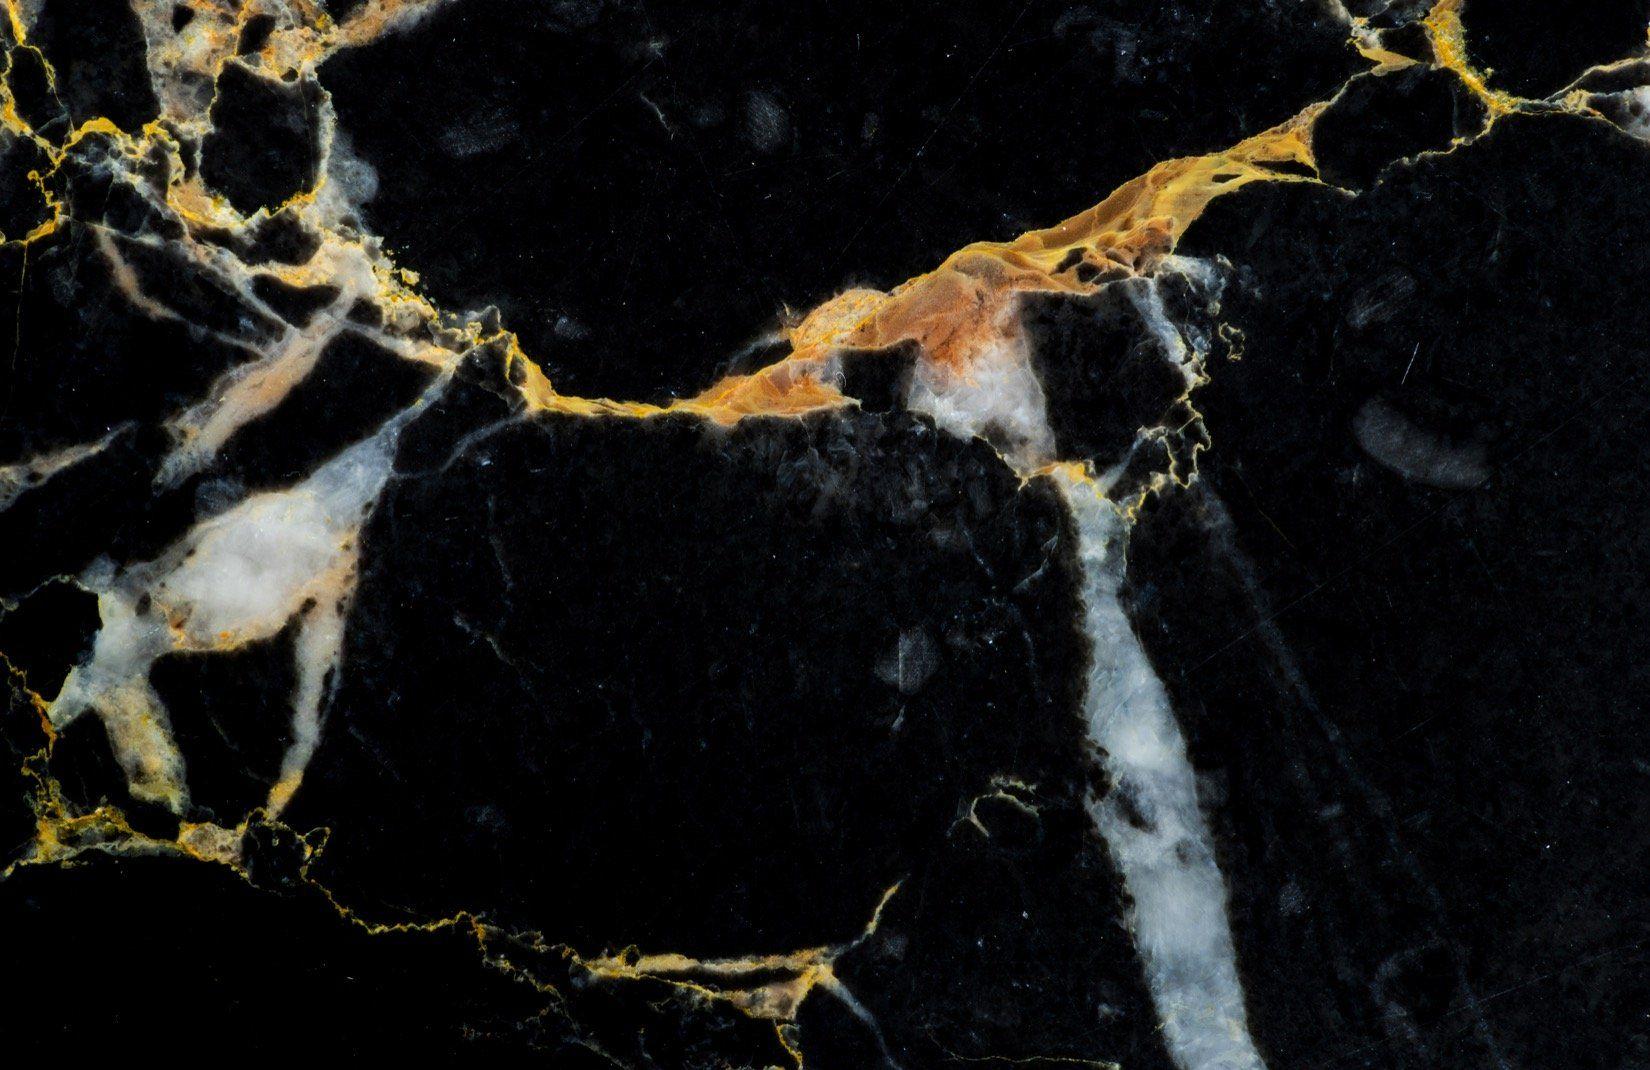 Black Gold Dark Marble Effect Wallpaper Mural Hovia Black And Gold Marble Gold Marble Wallpaper Marble Effect Wallpaper